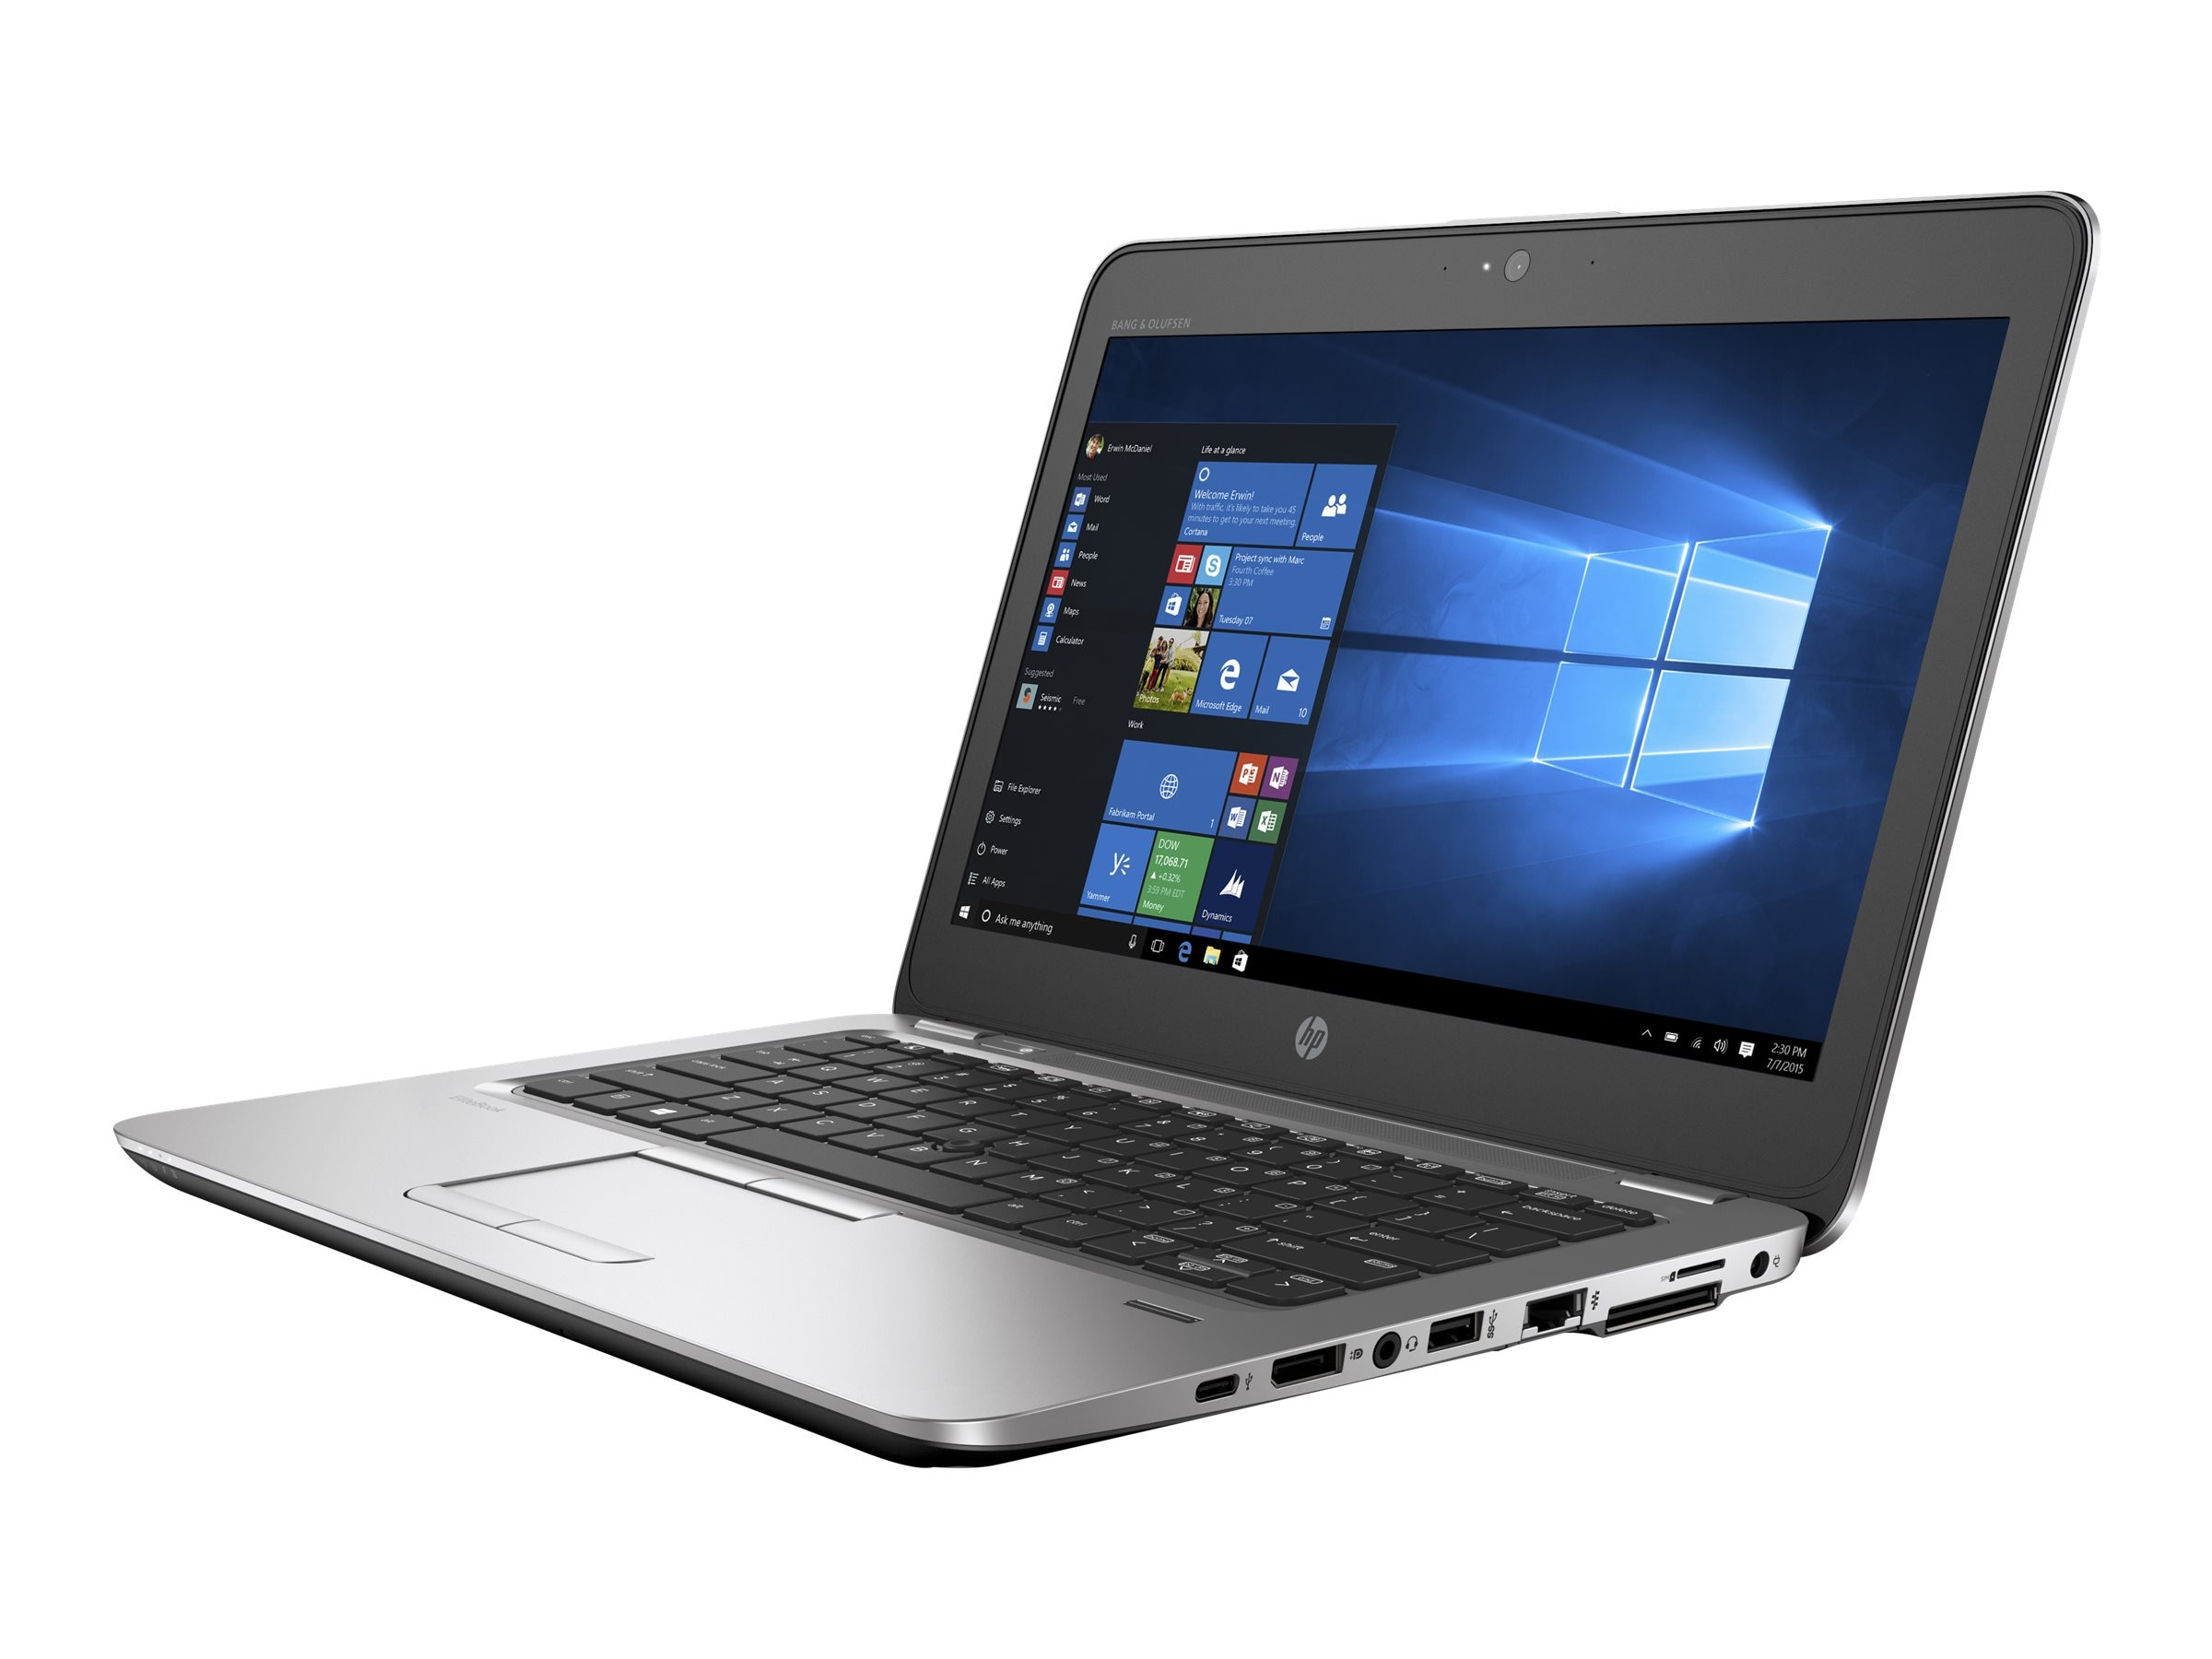 HP EliteBook 725 G4 2.5GHz A12 12.5in display, 1GF02UA#ABA, 33797802, Notebooks